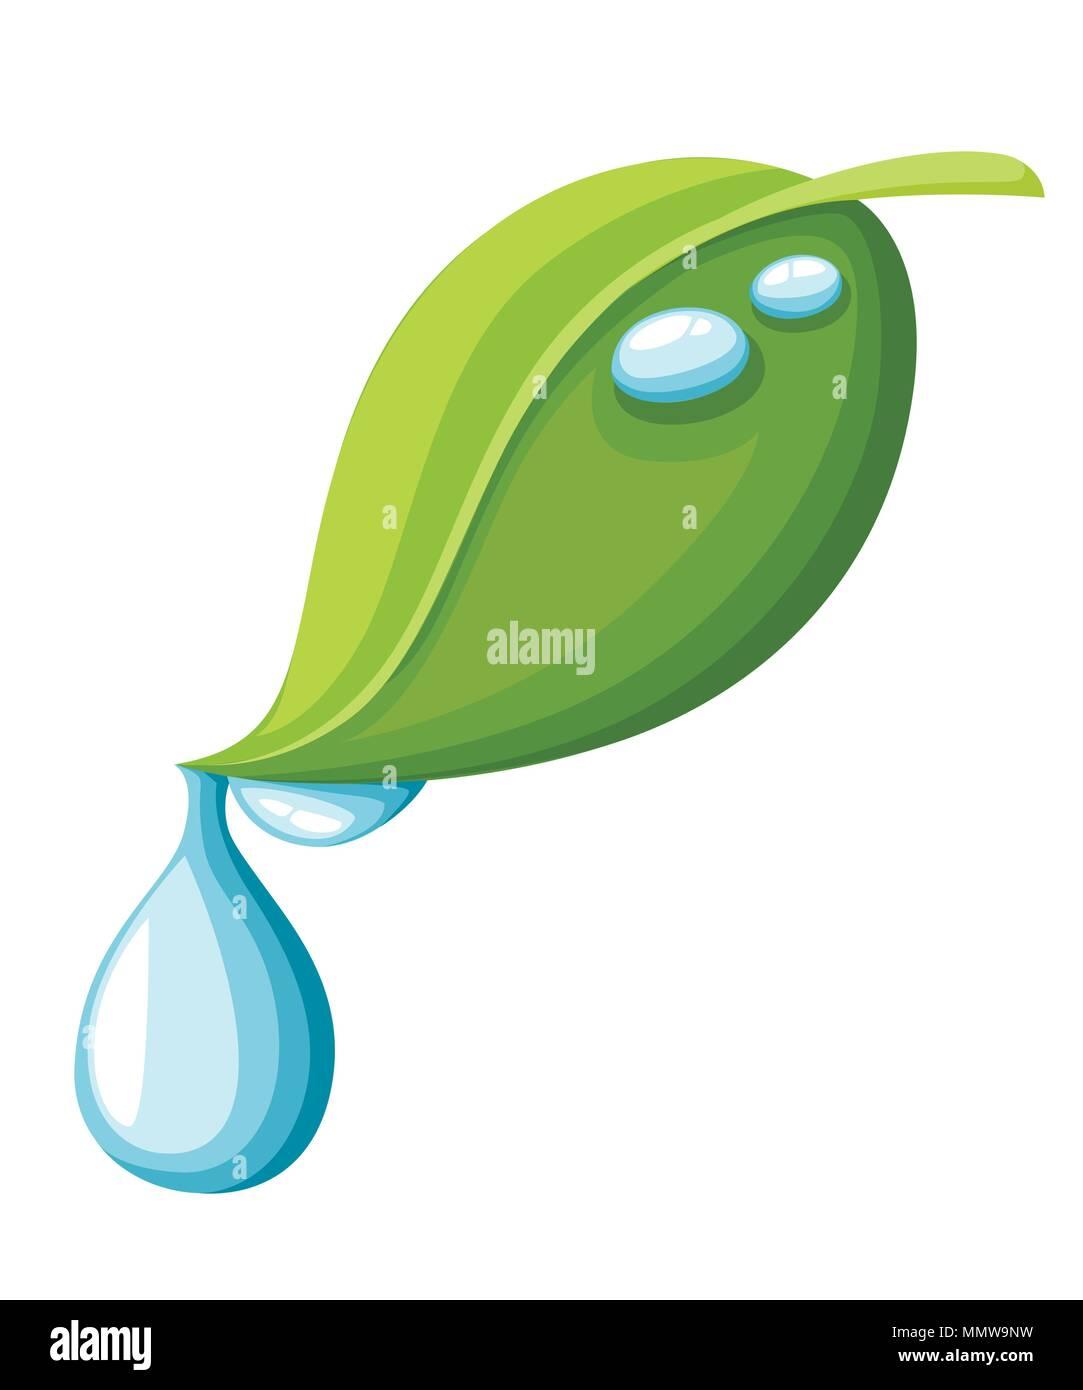 Verde Hoja Con Gota De Agua Piso Estilo De Dibujos Animados